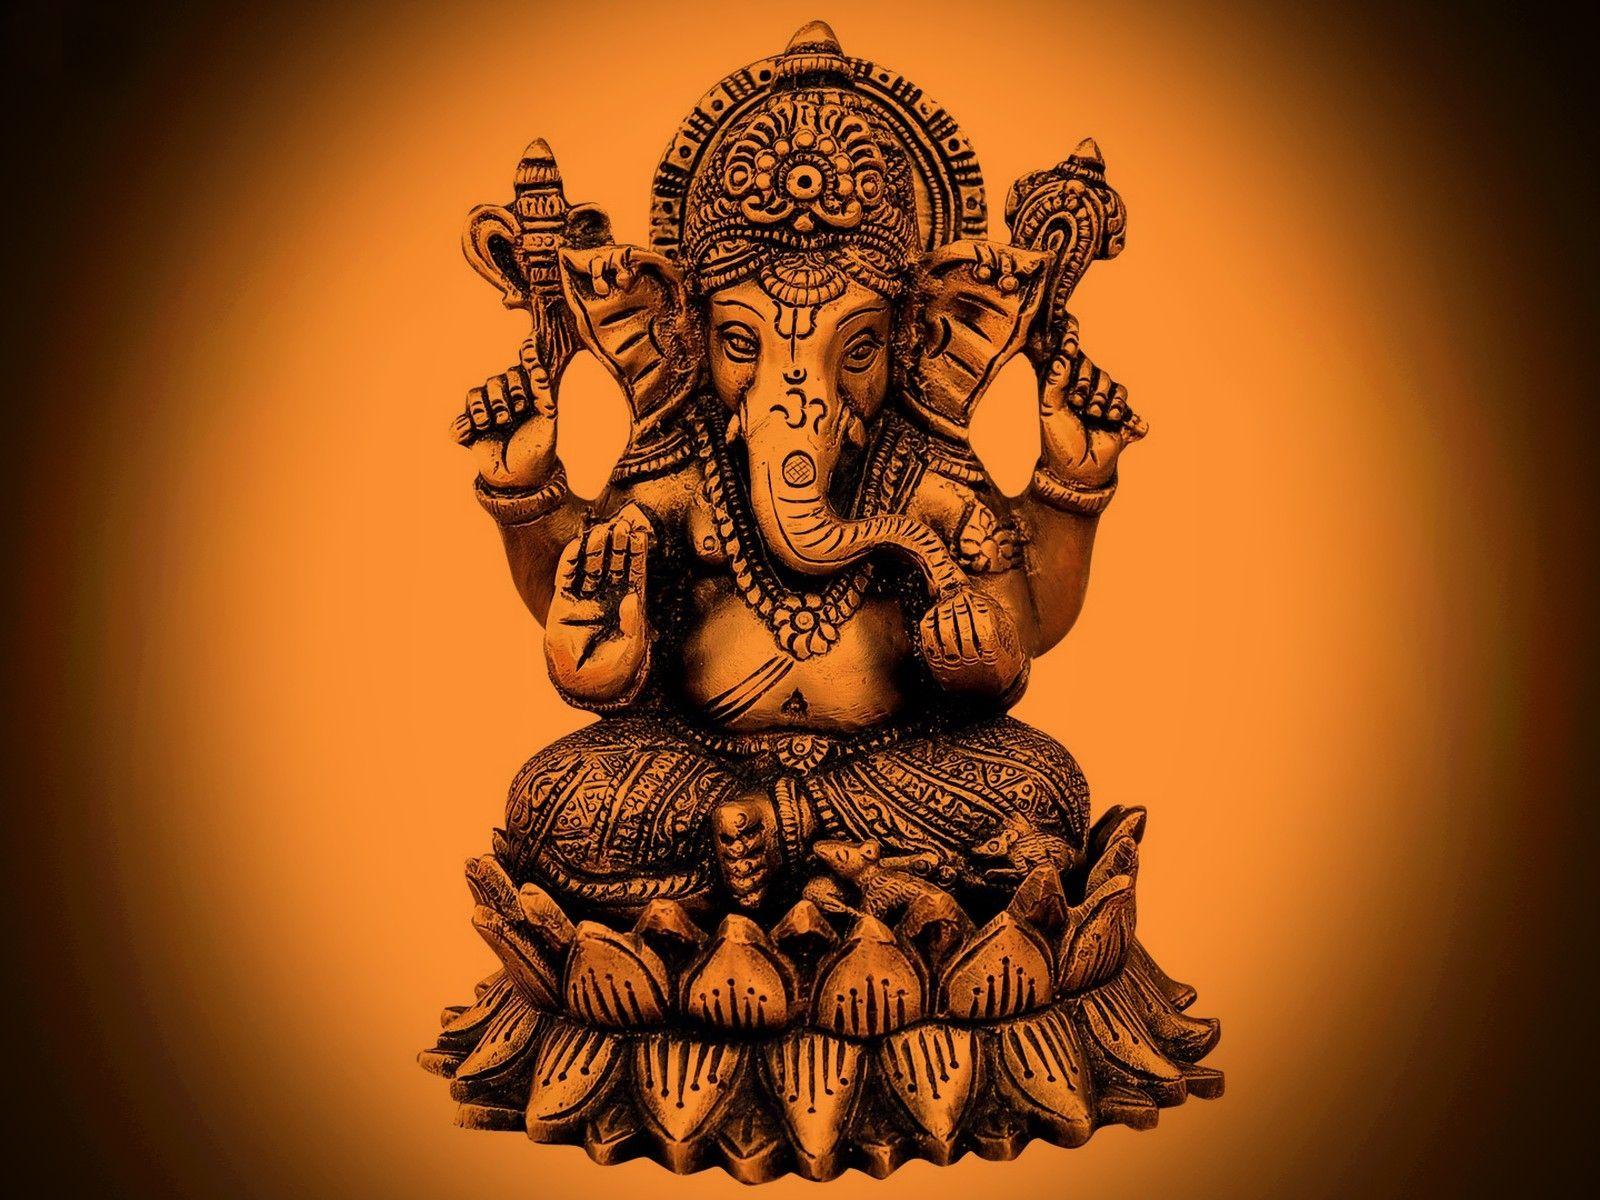 Hd wallpaper ganpati - Ganesha Painting Pillayar Wallpaper Free Download